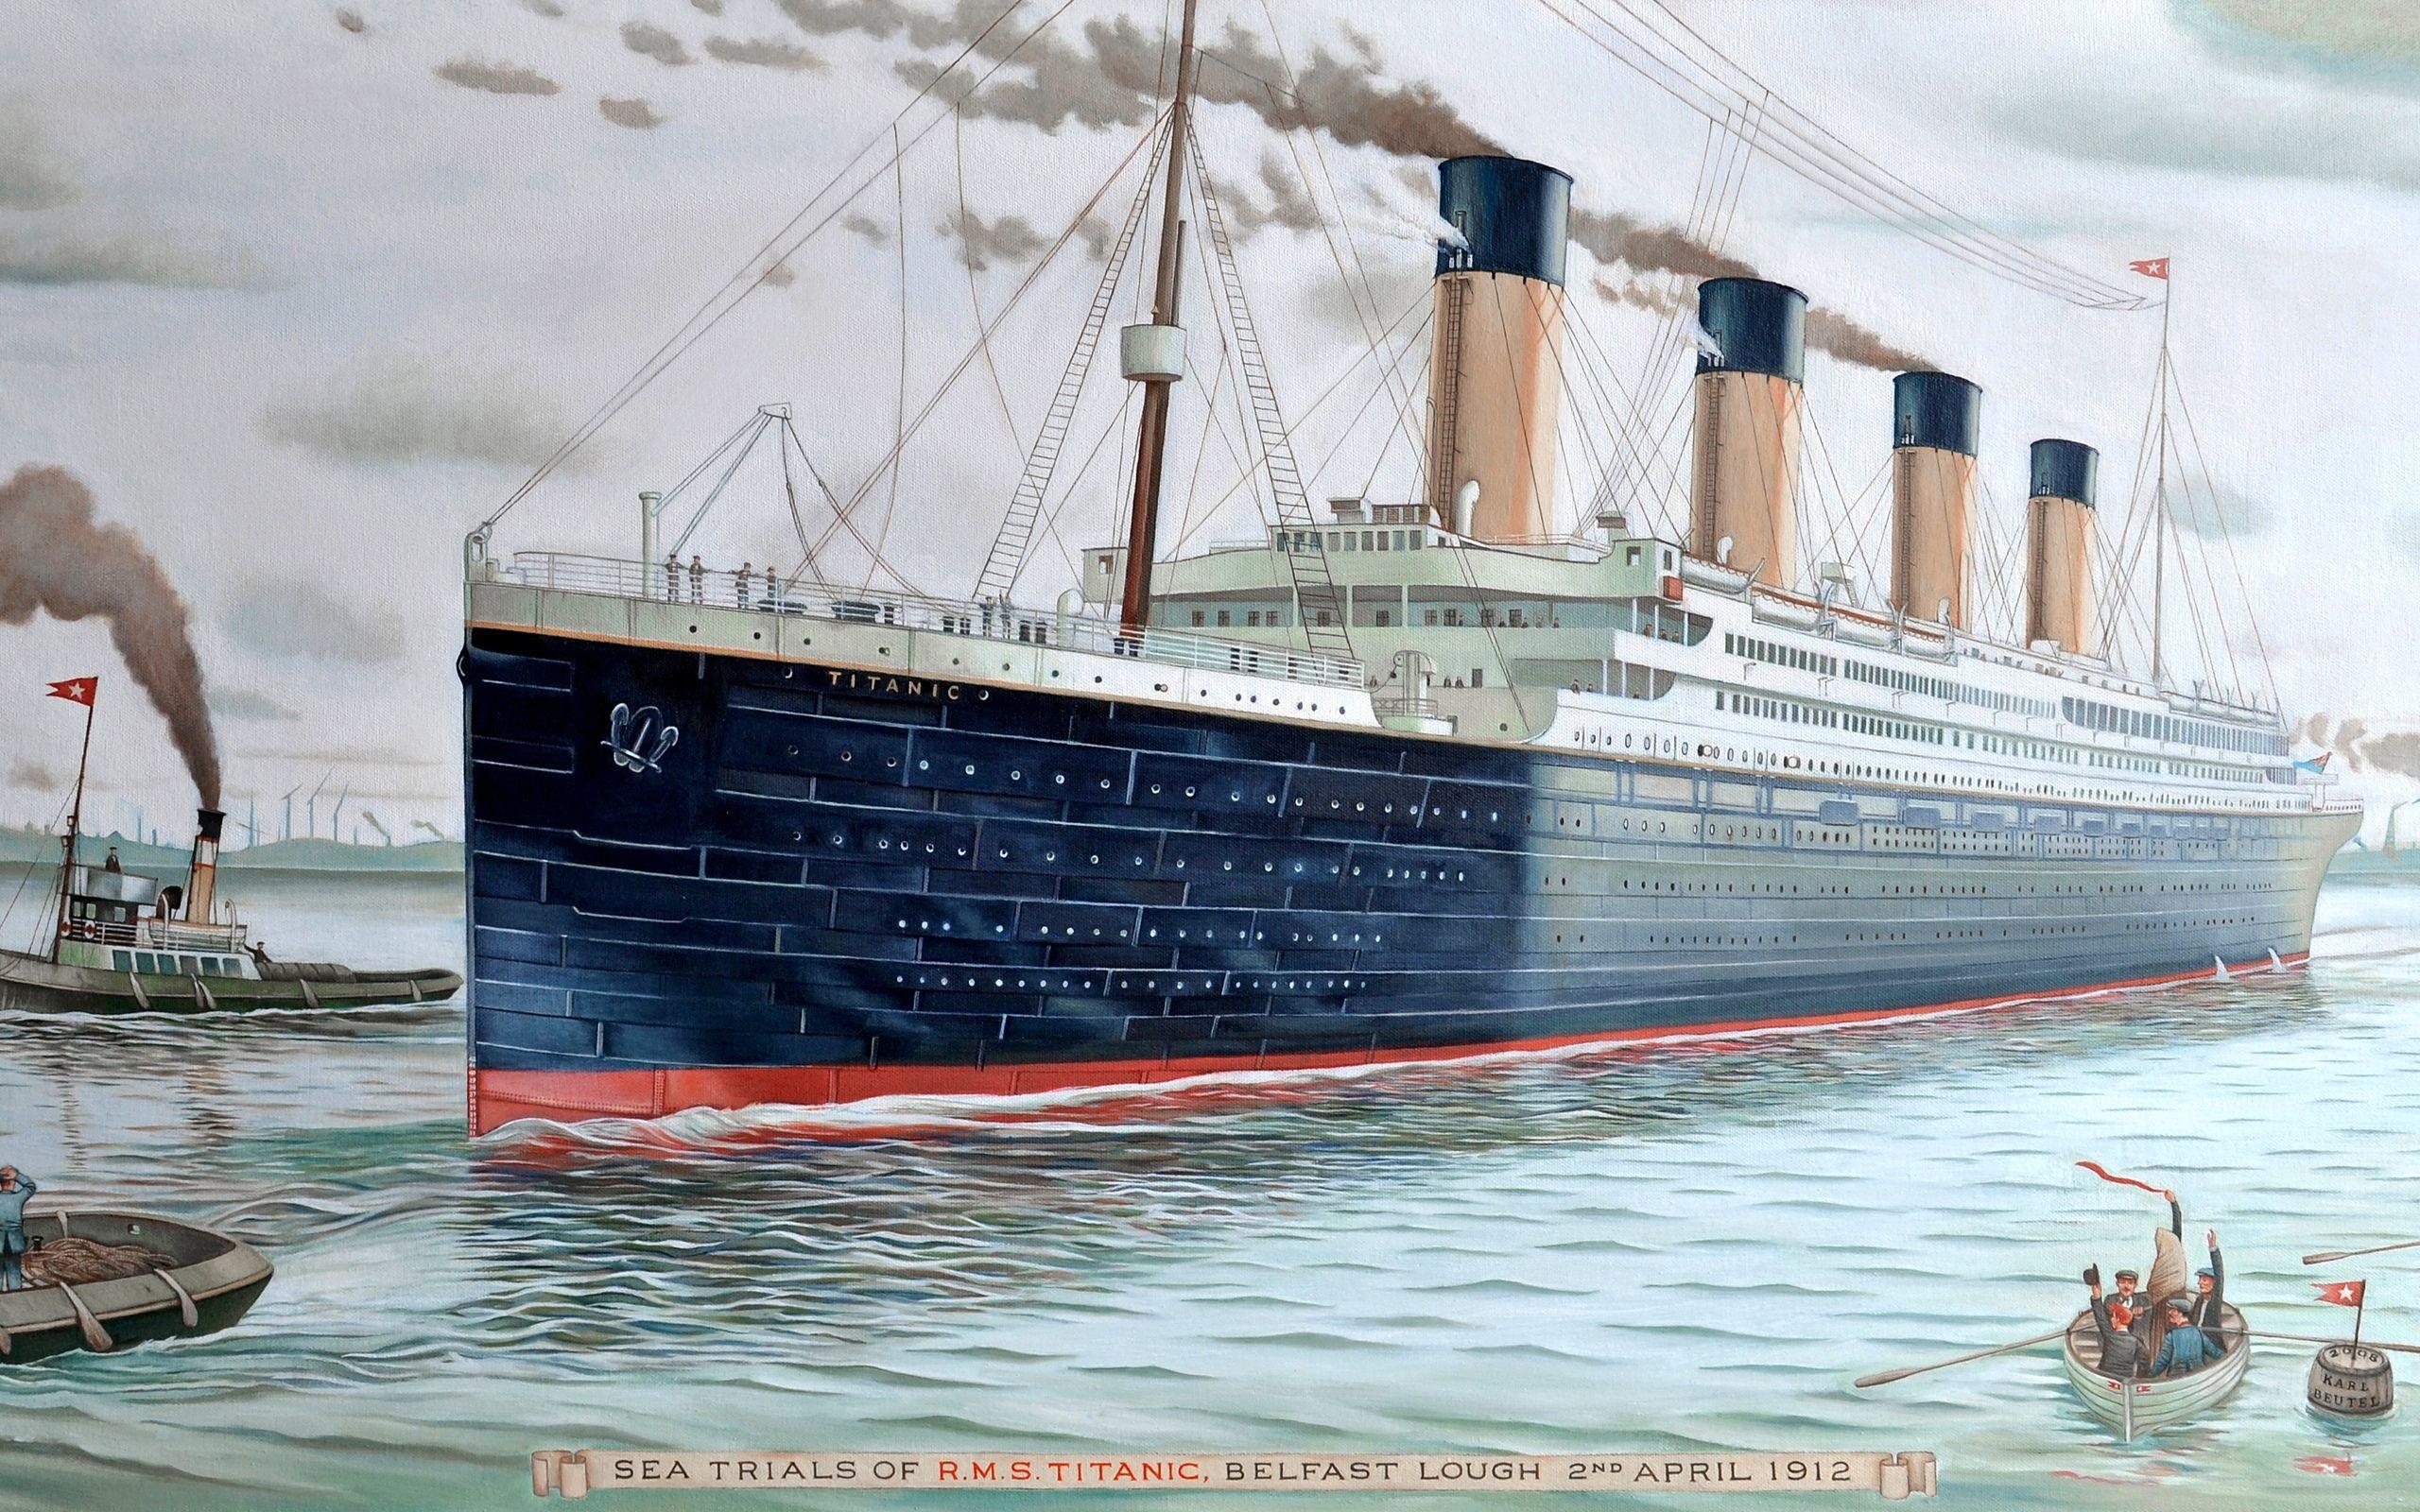 titanic download free